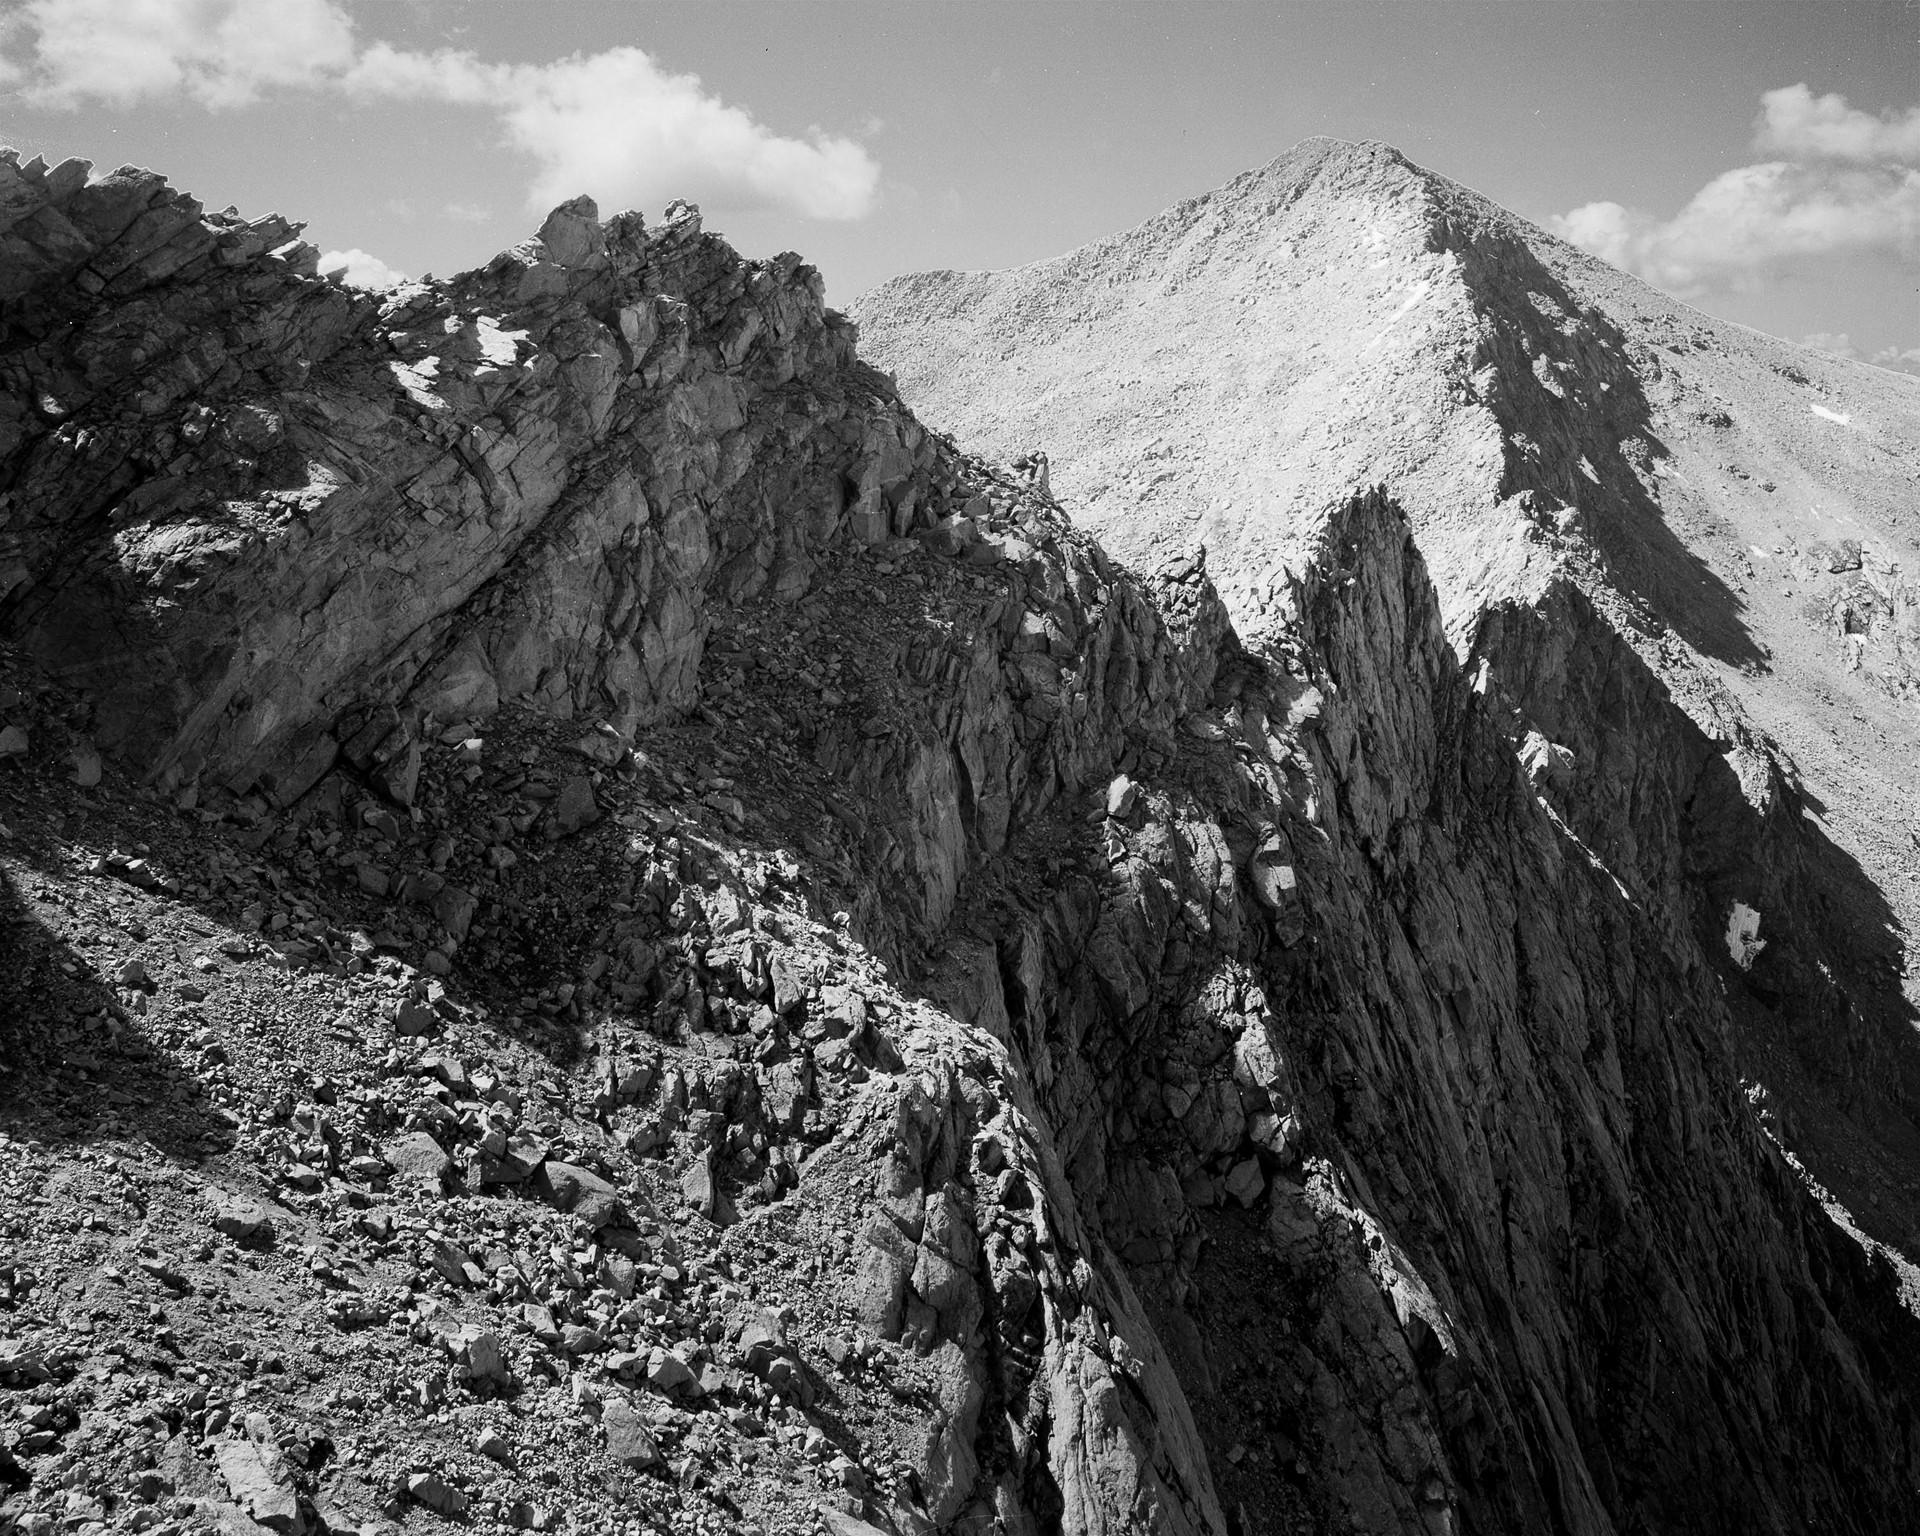 Mount Bierstadt & Sawtooth Ridge